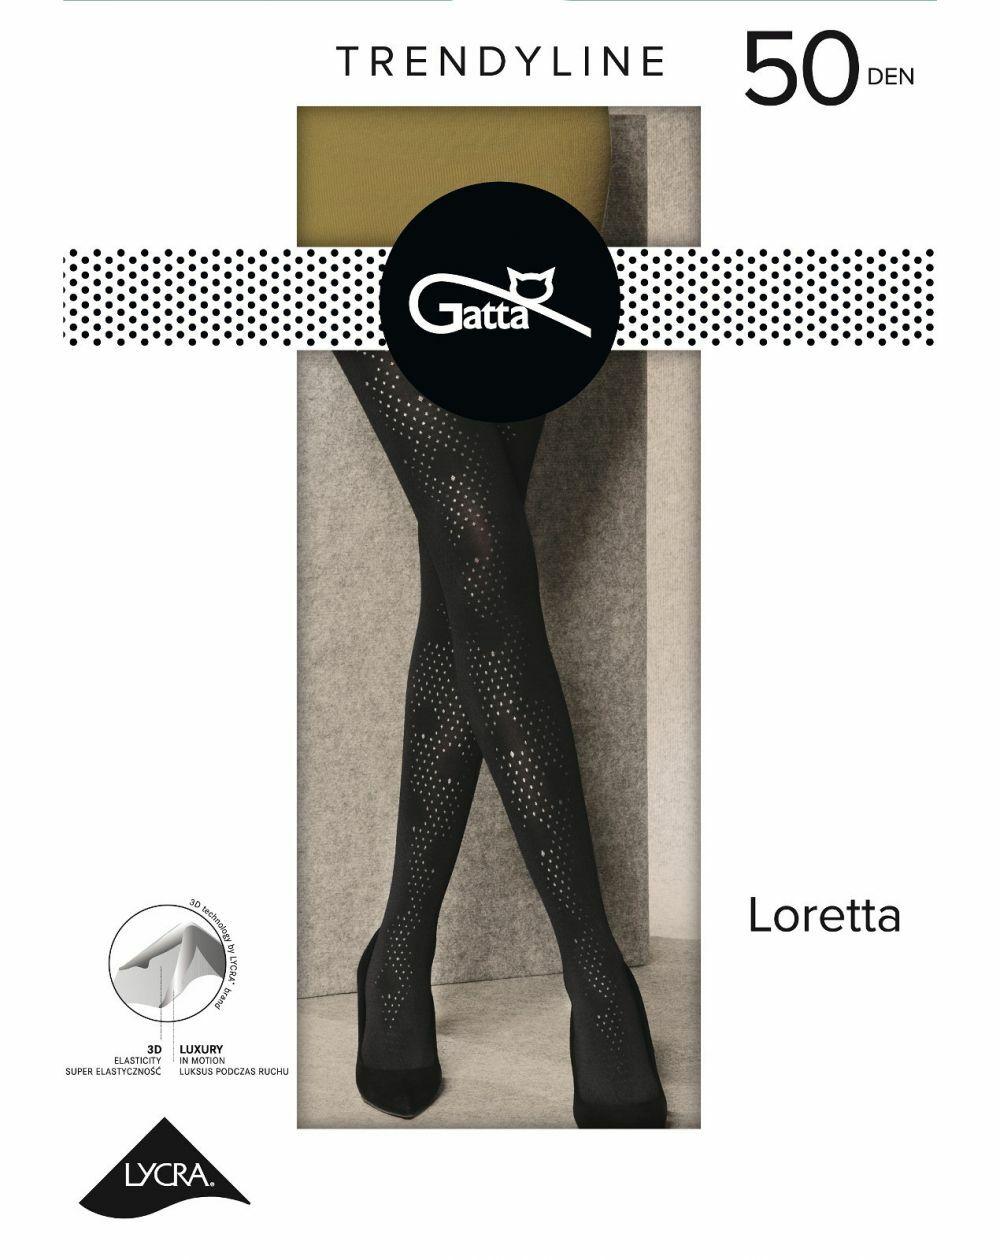 Rajstopy Gatta Loretta wz.122 50 den 2-4